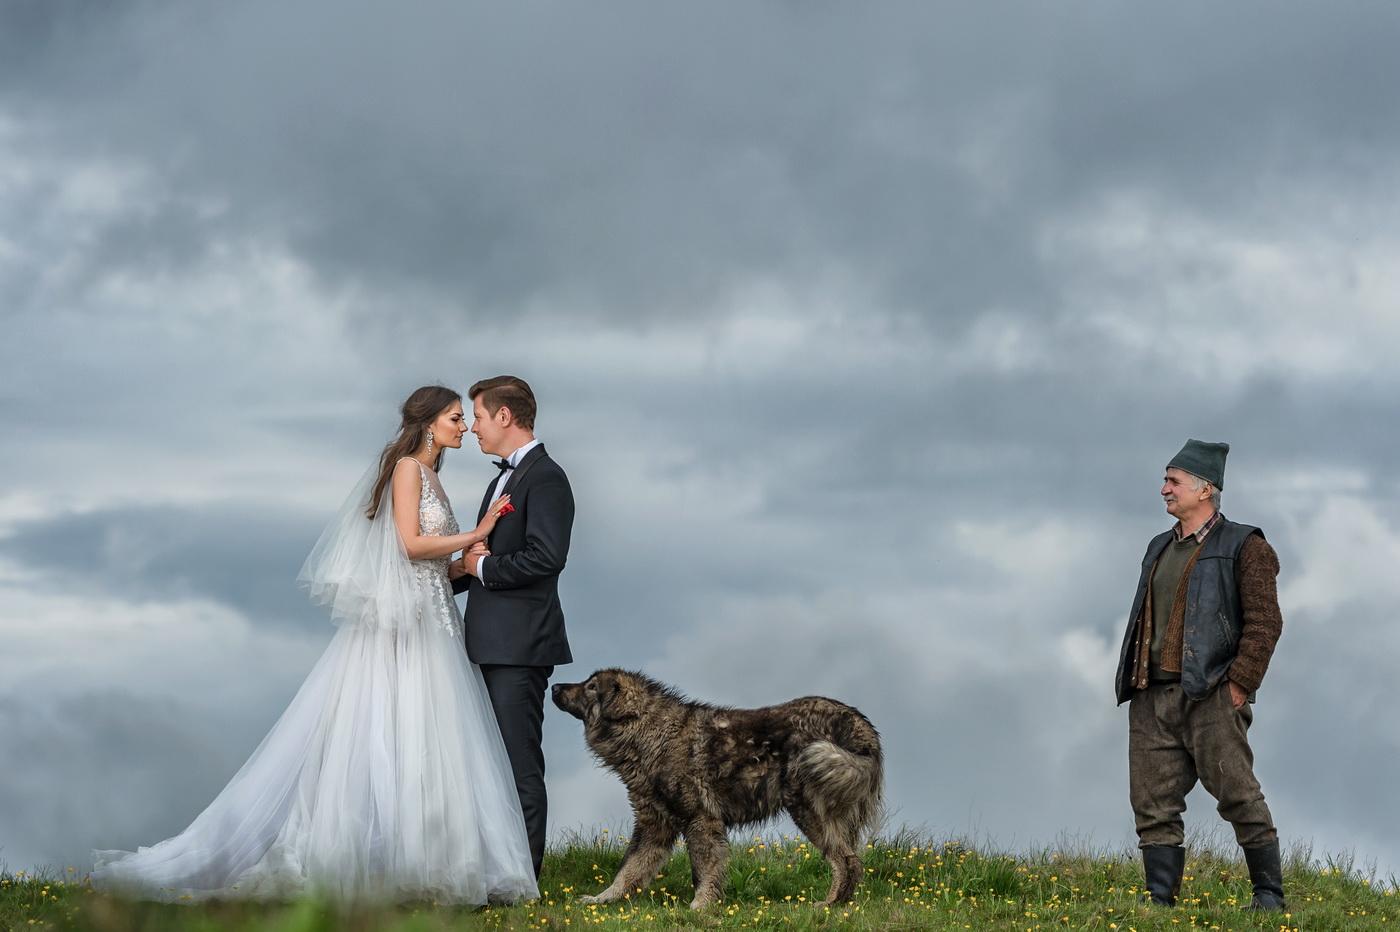 Destination Wedding Photographer_Marian Sterea_217.jpg